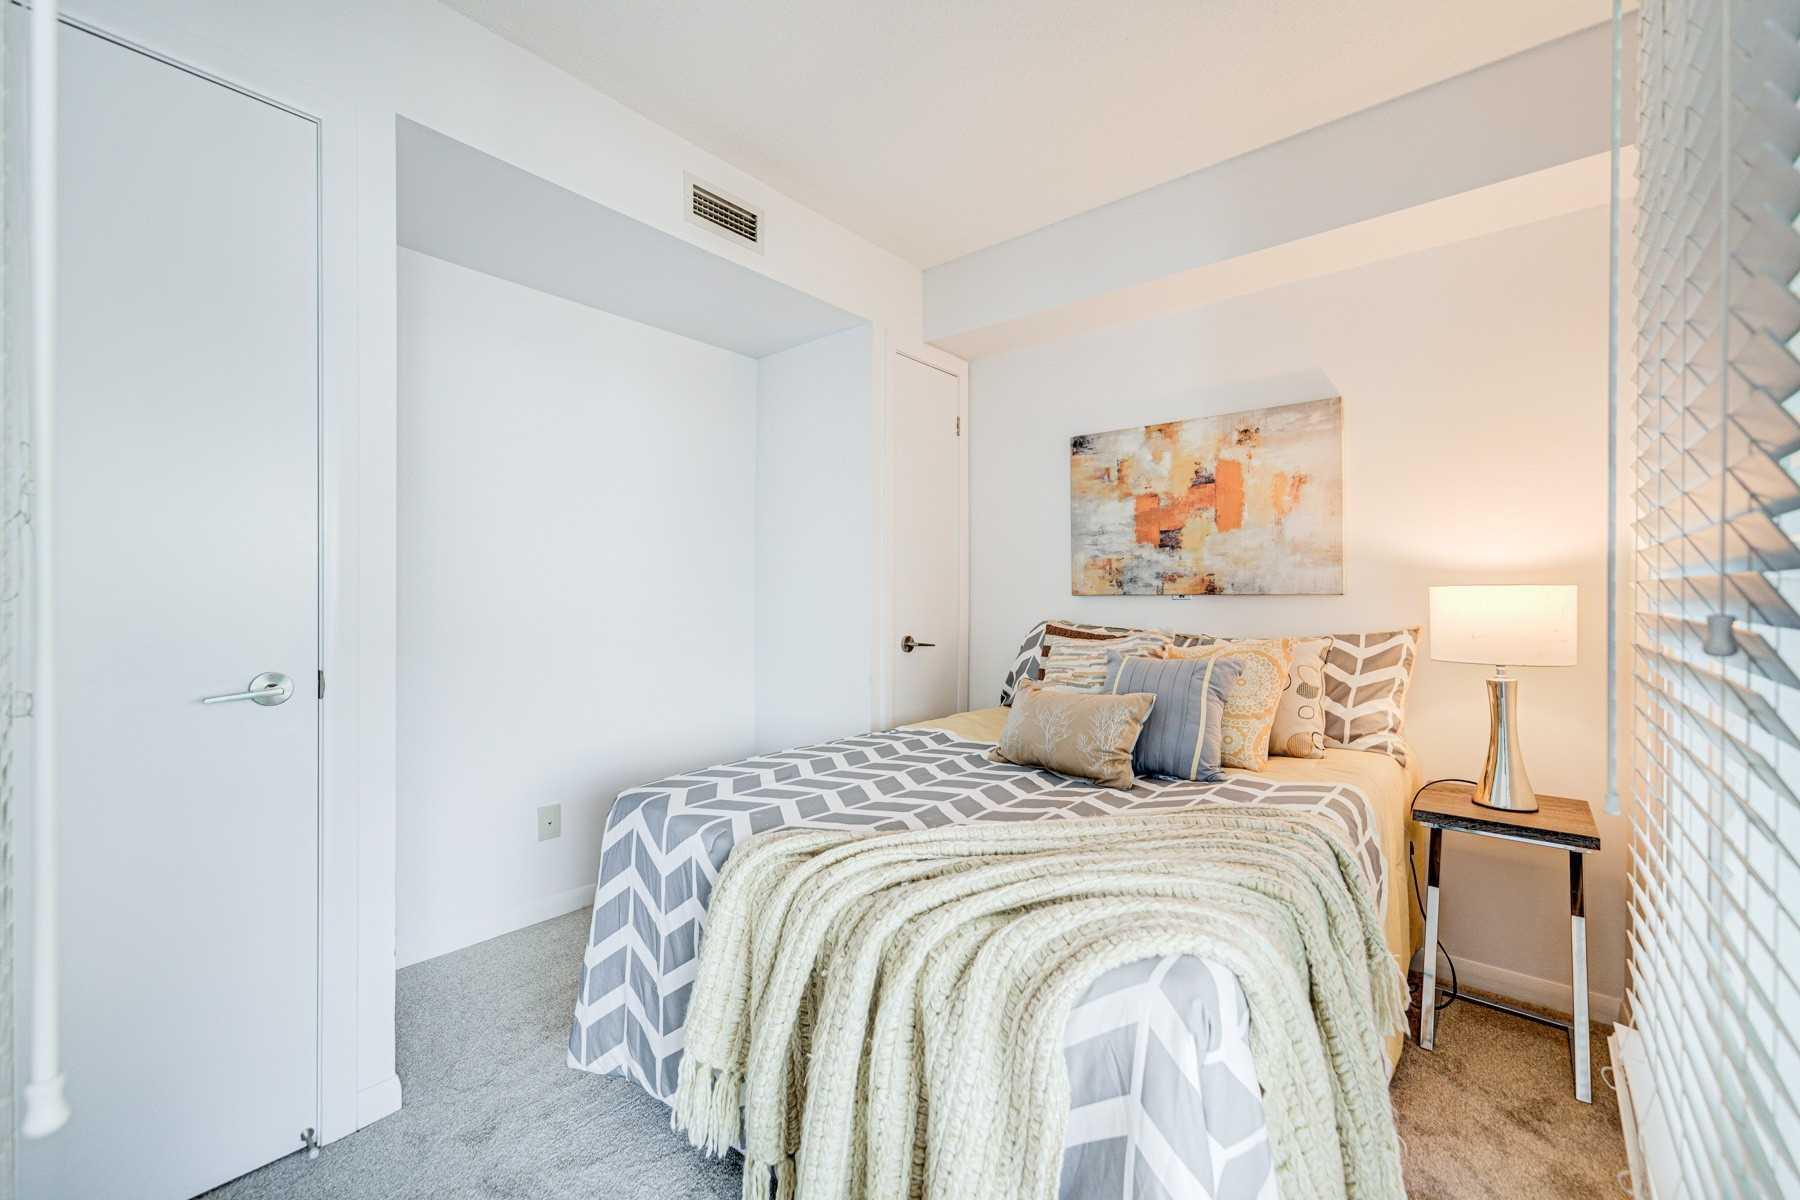 Condo Apt For Sale In Toronto , 2 Bedrooms Bedrooms, ,1 BathroomBathrooms,Condo Apt,For Sale,1511,Fort York